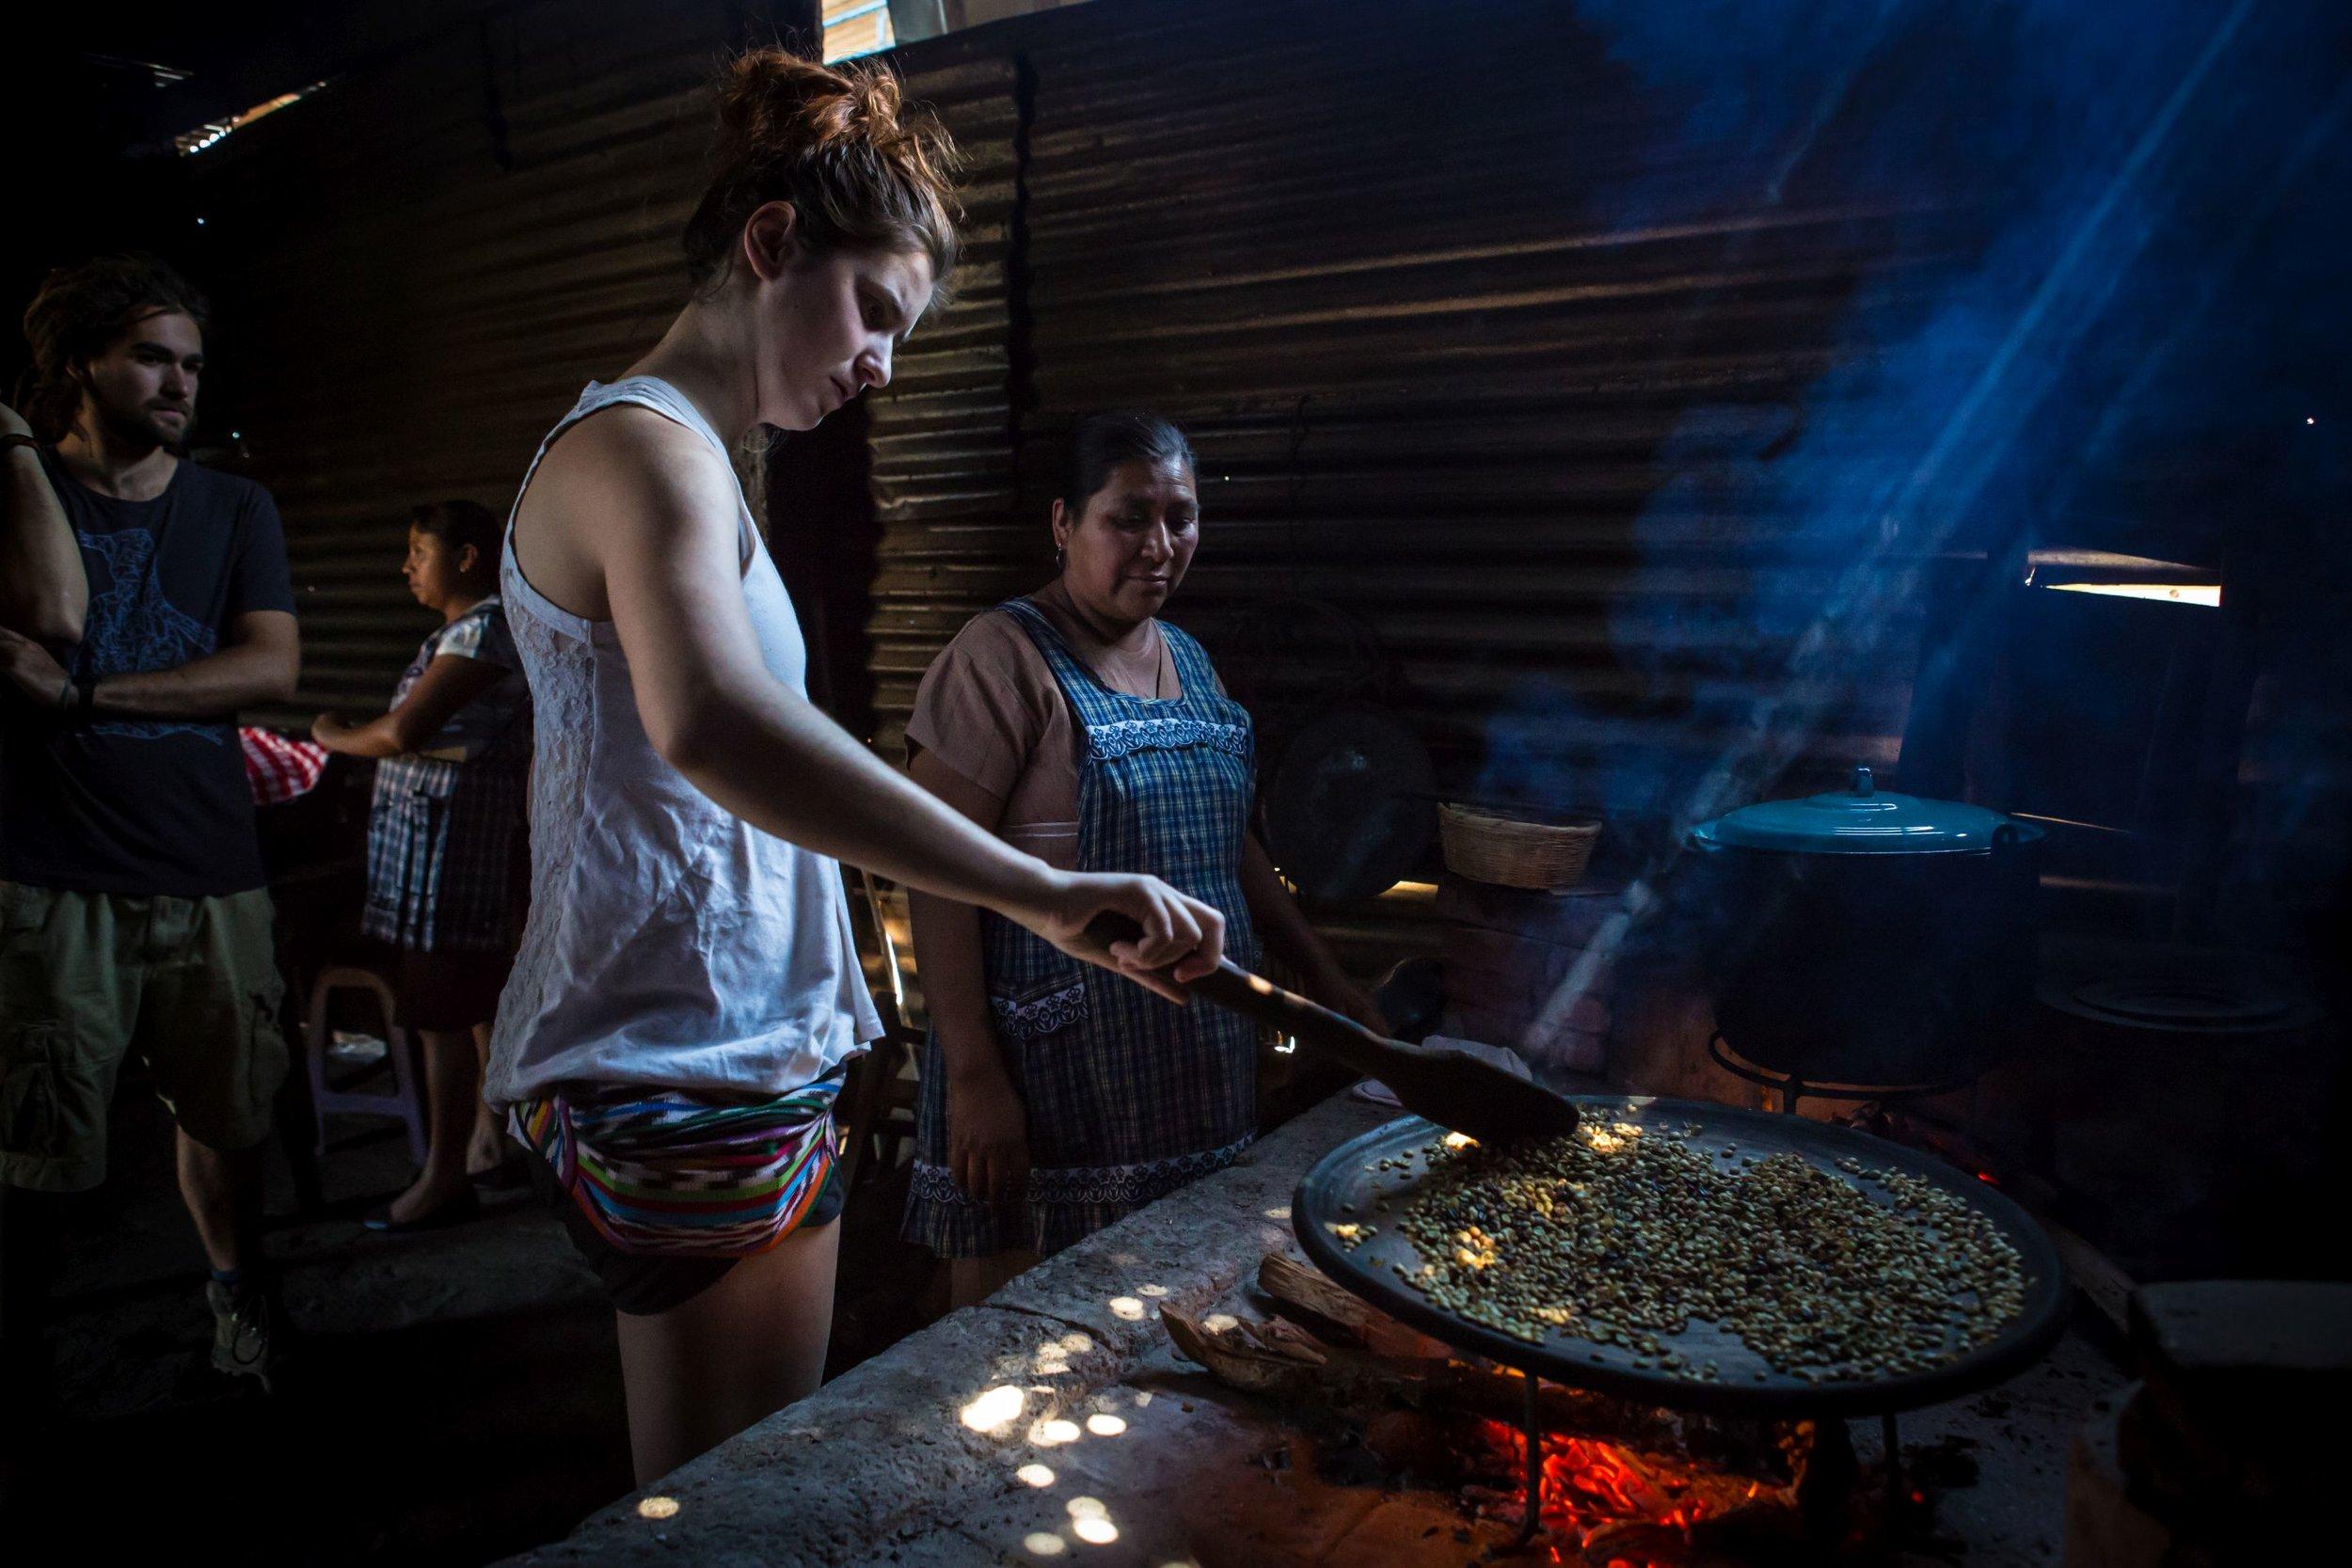 Tourist roasting coffee the traditional way.